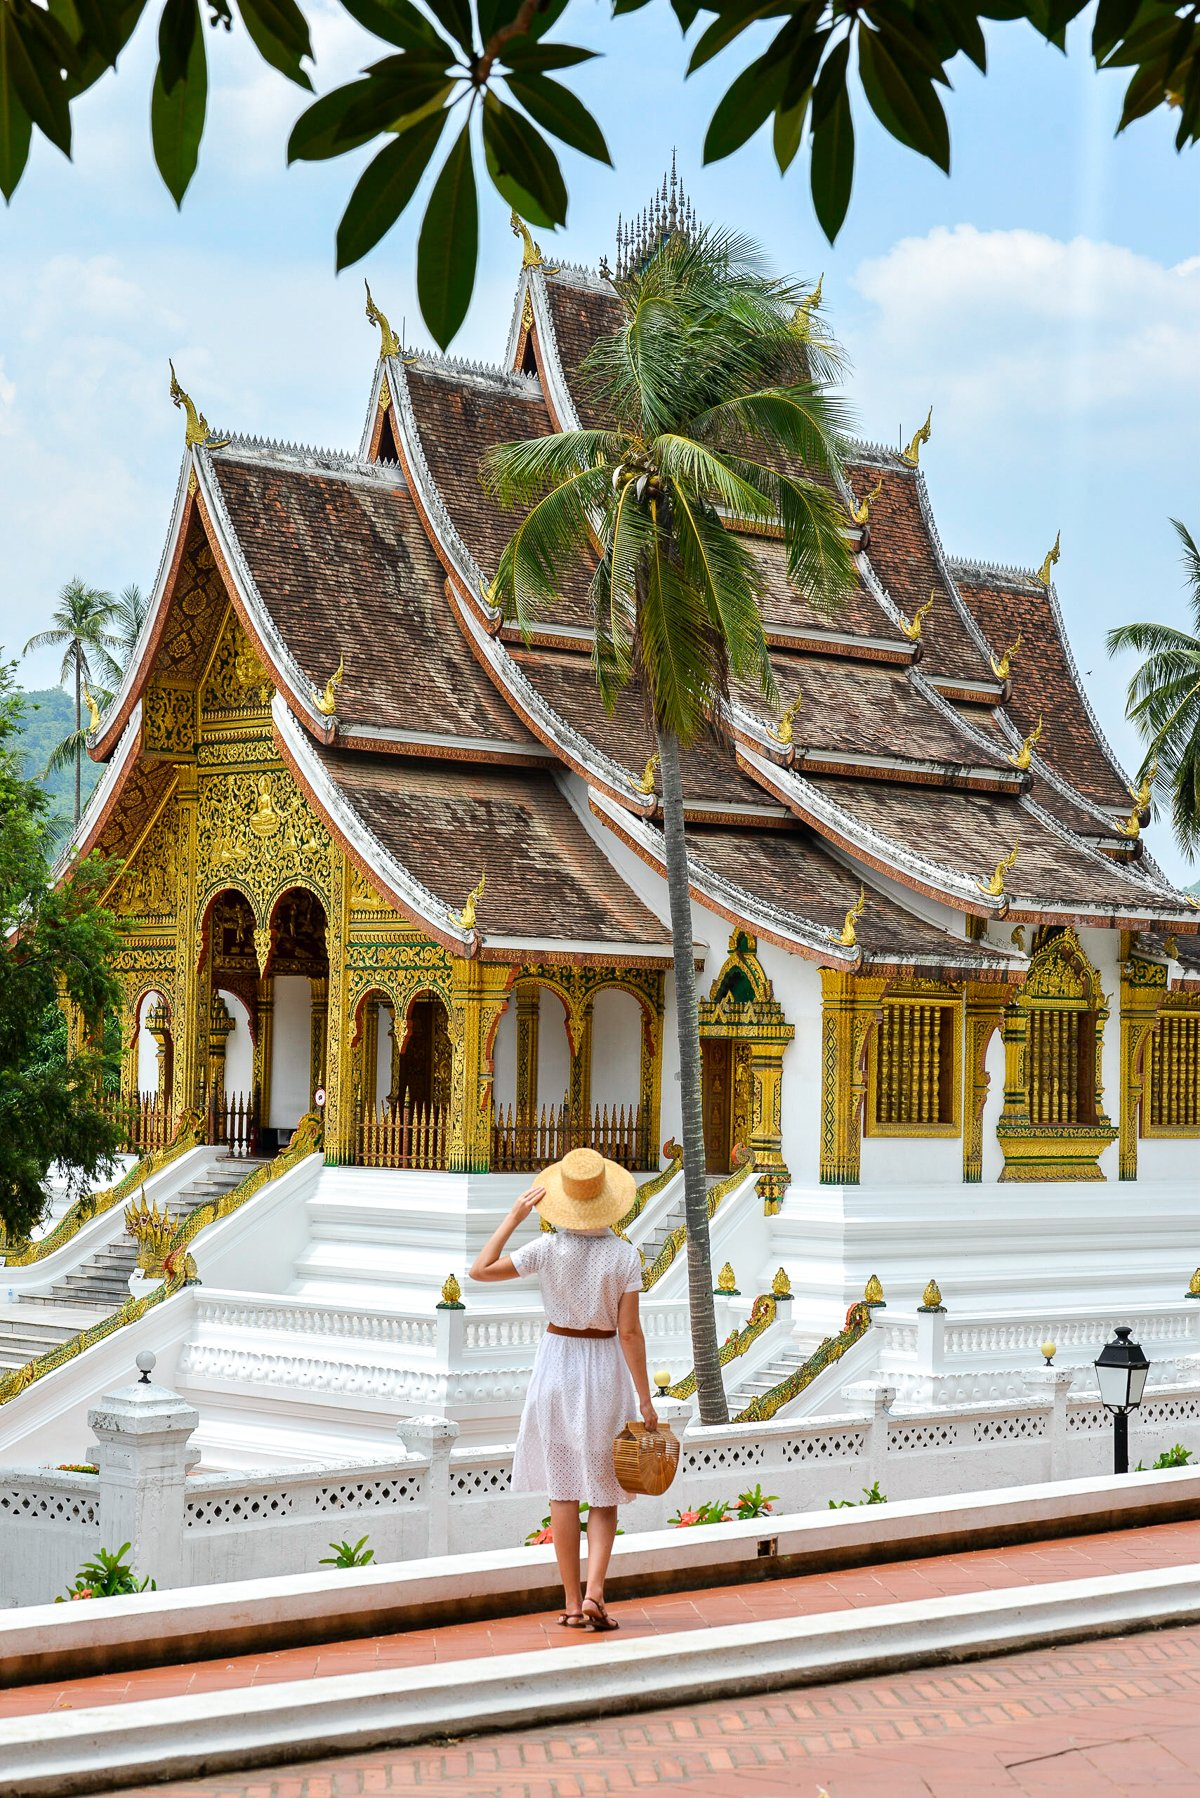 Stacie Flinner 3 Nagas Complete Guide to Luang Prabang-110.jpg